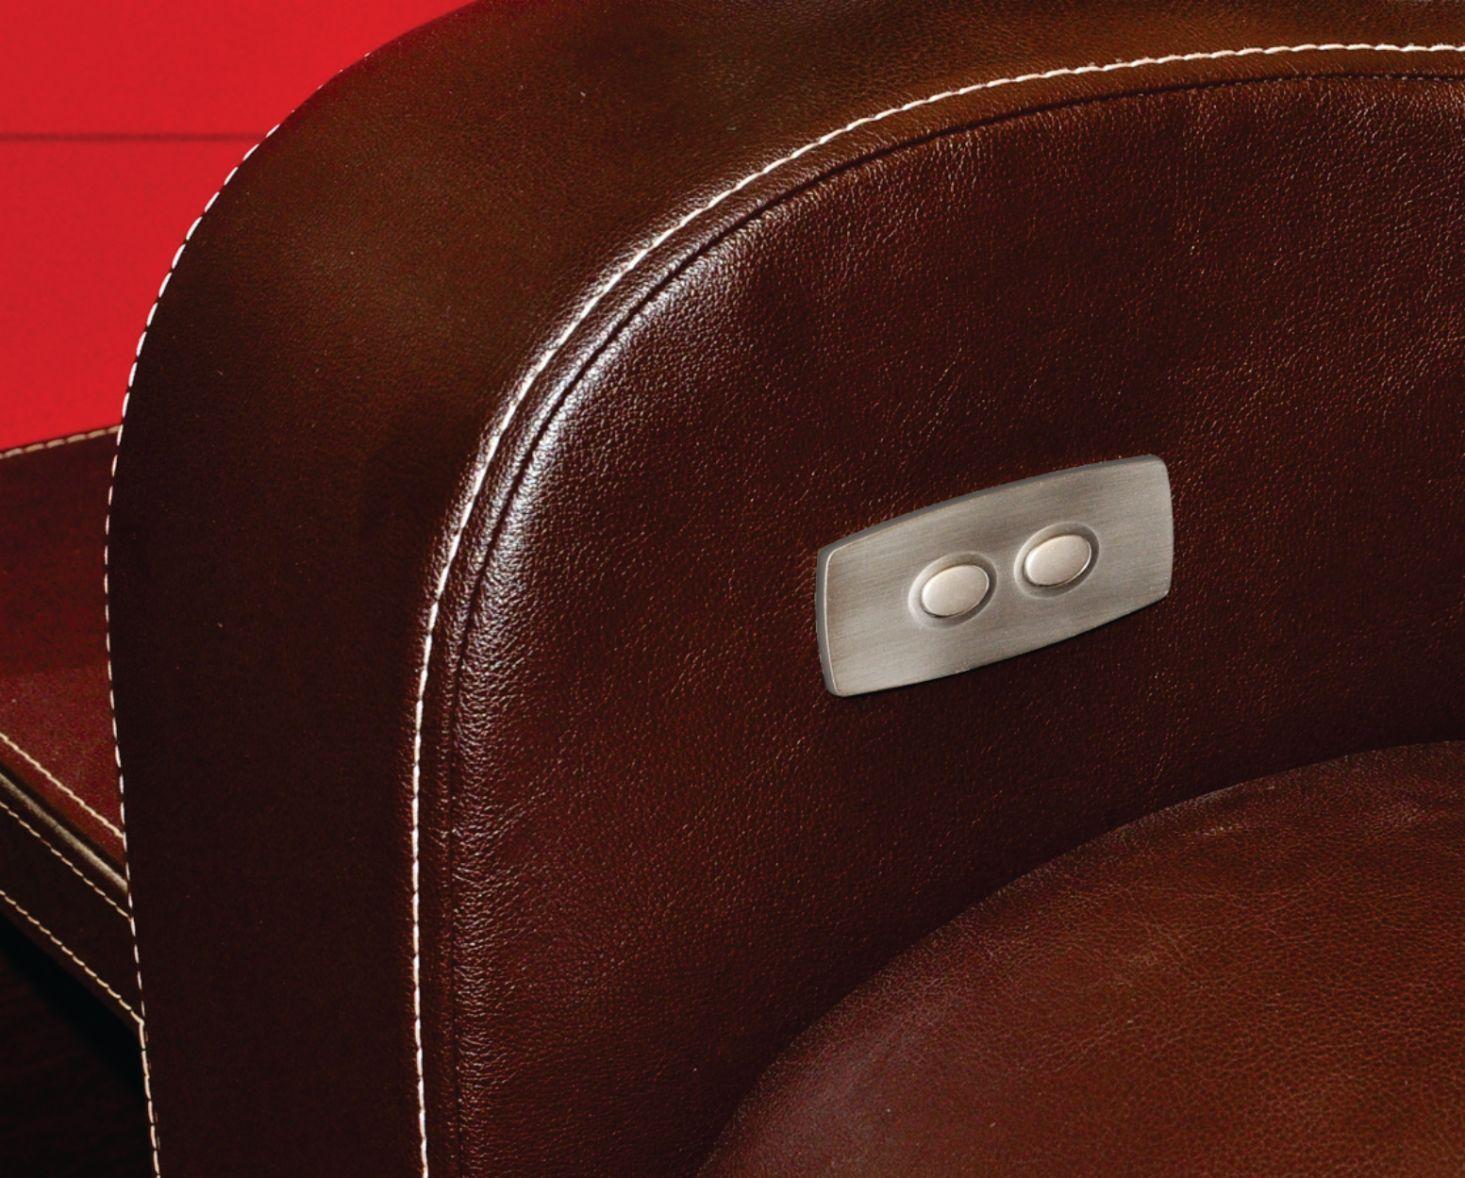 oval backlit switch / metal switch / remote - ln - 37